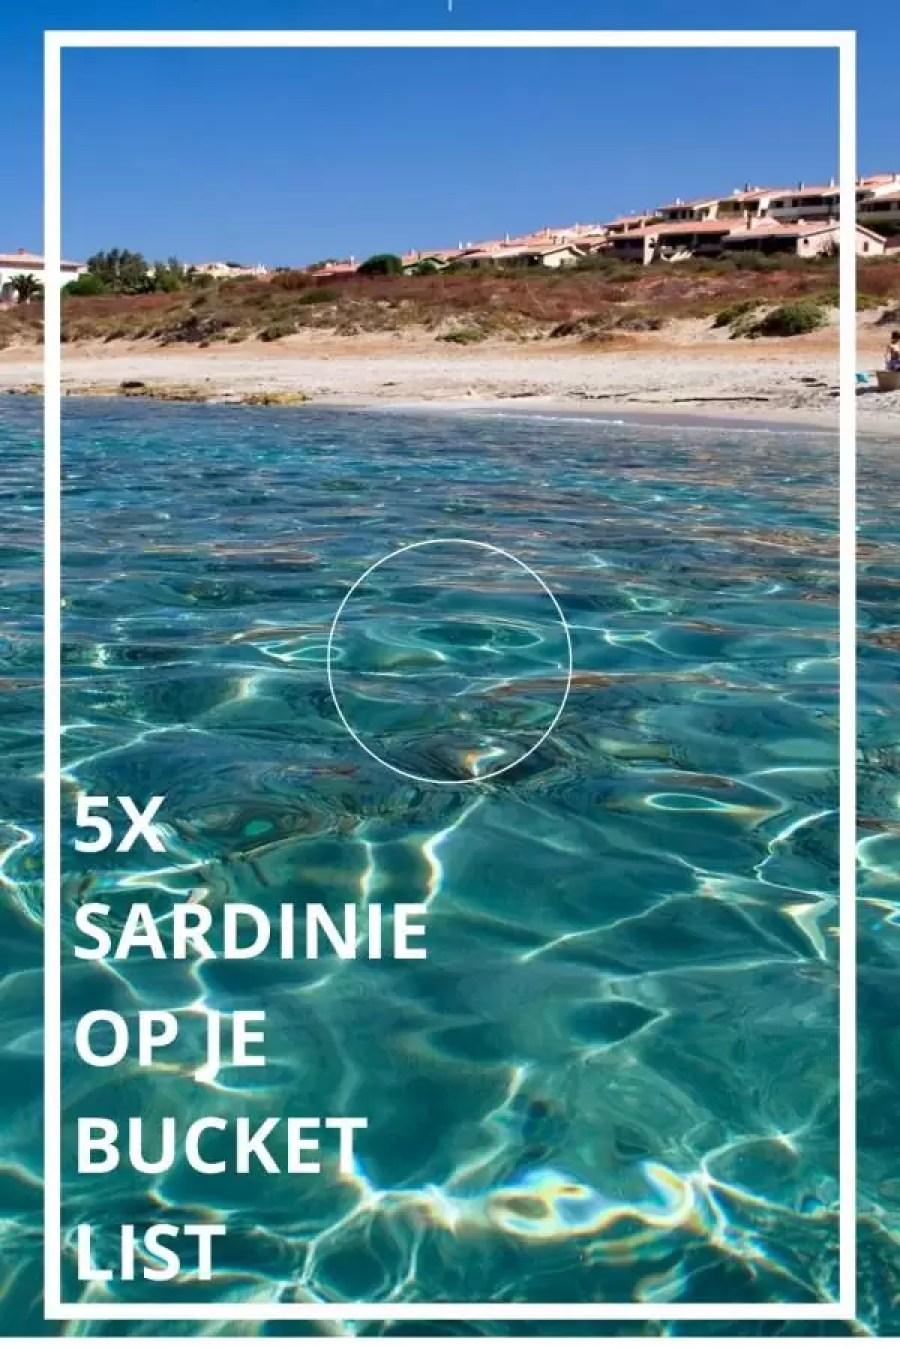 5x sardinie op je bucketlist